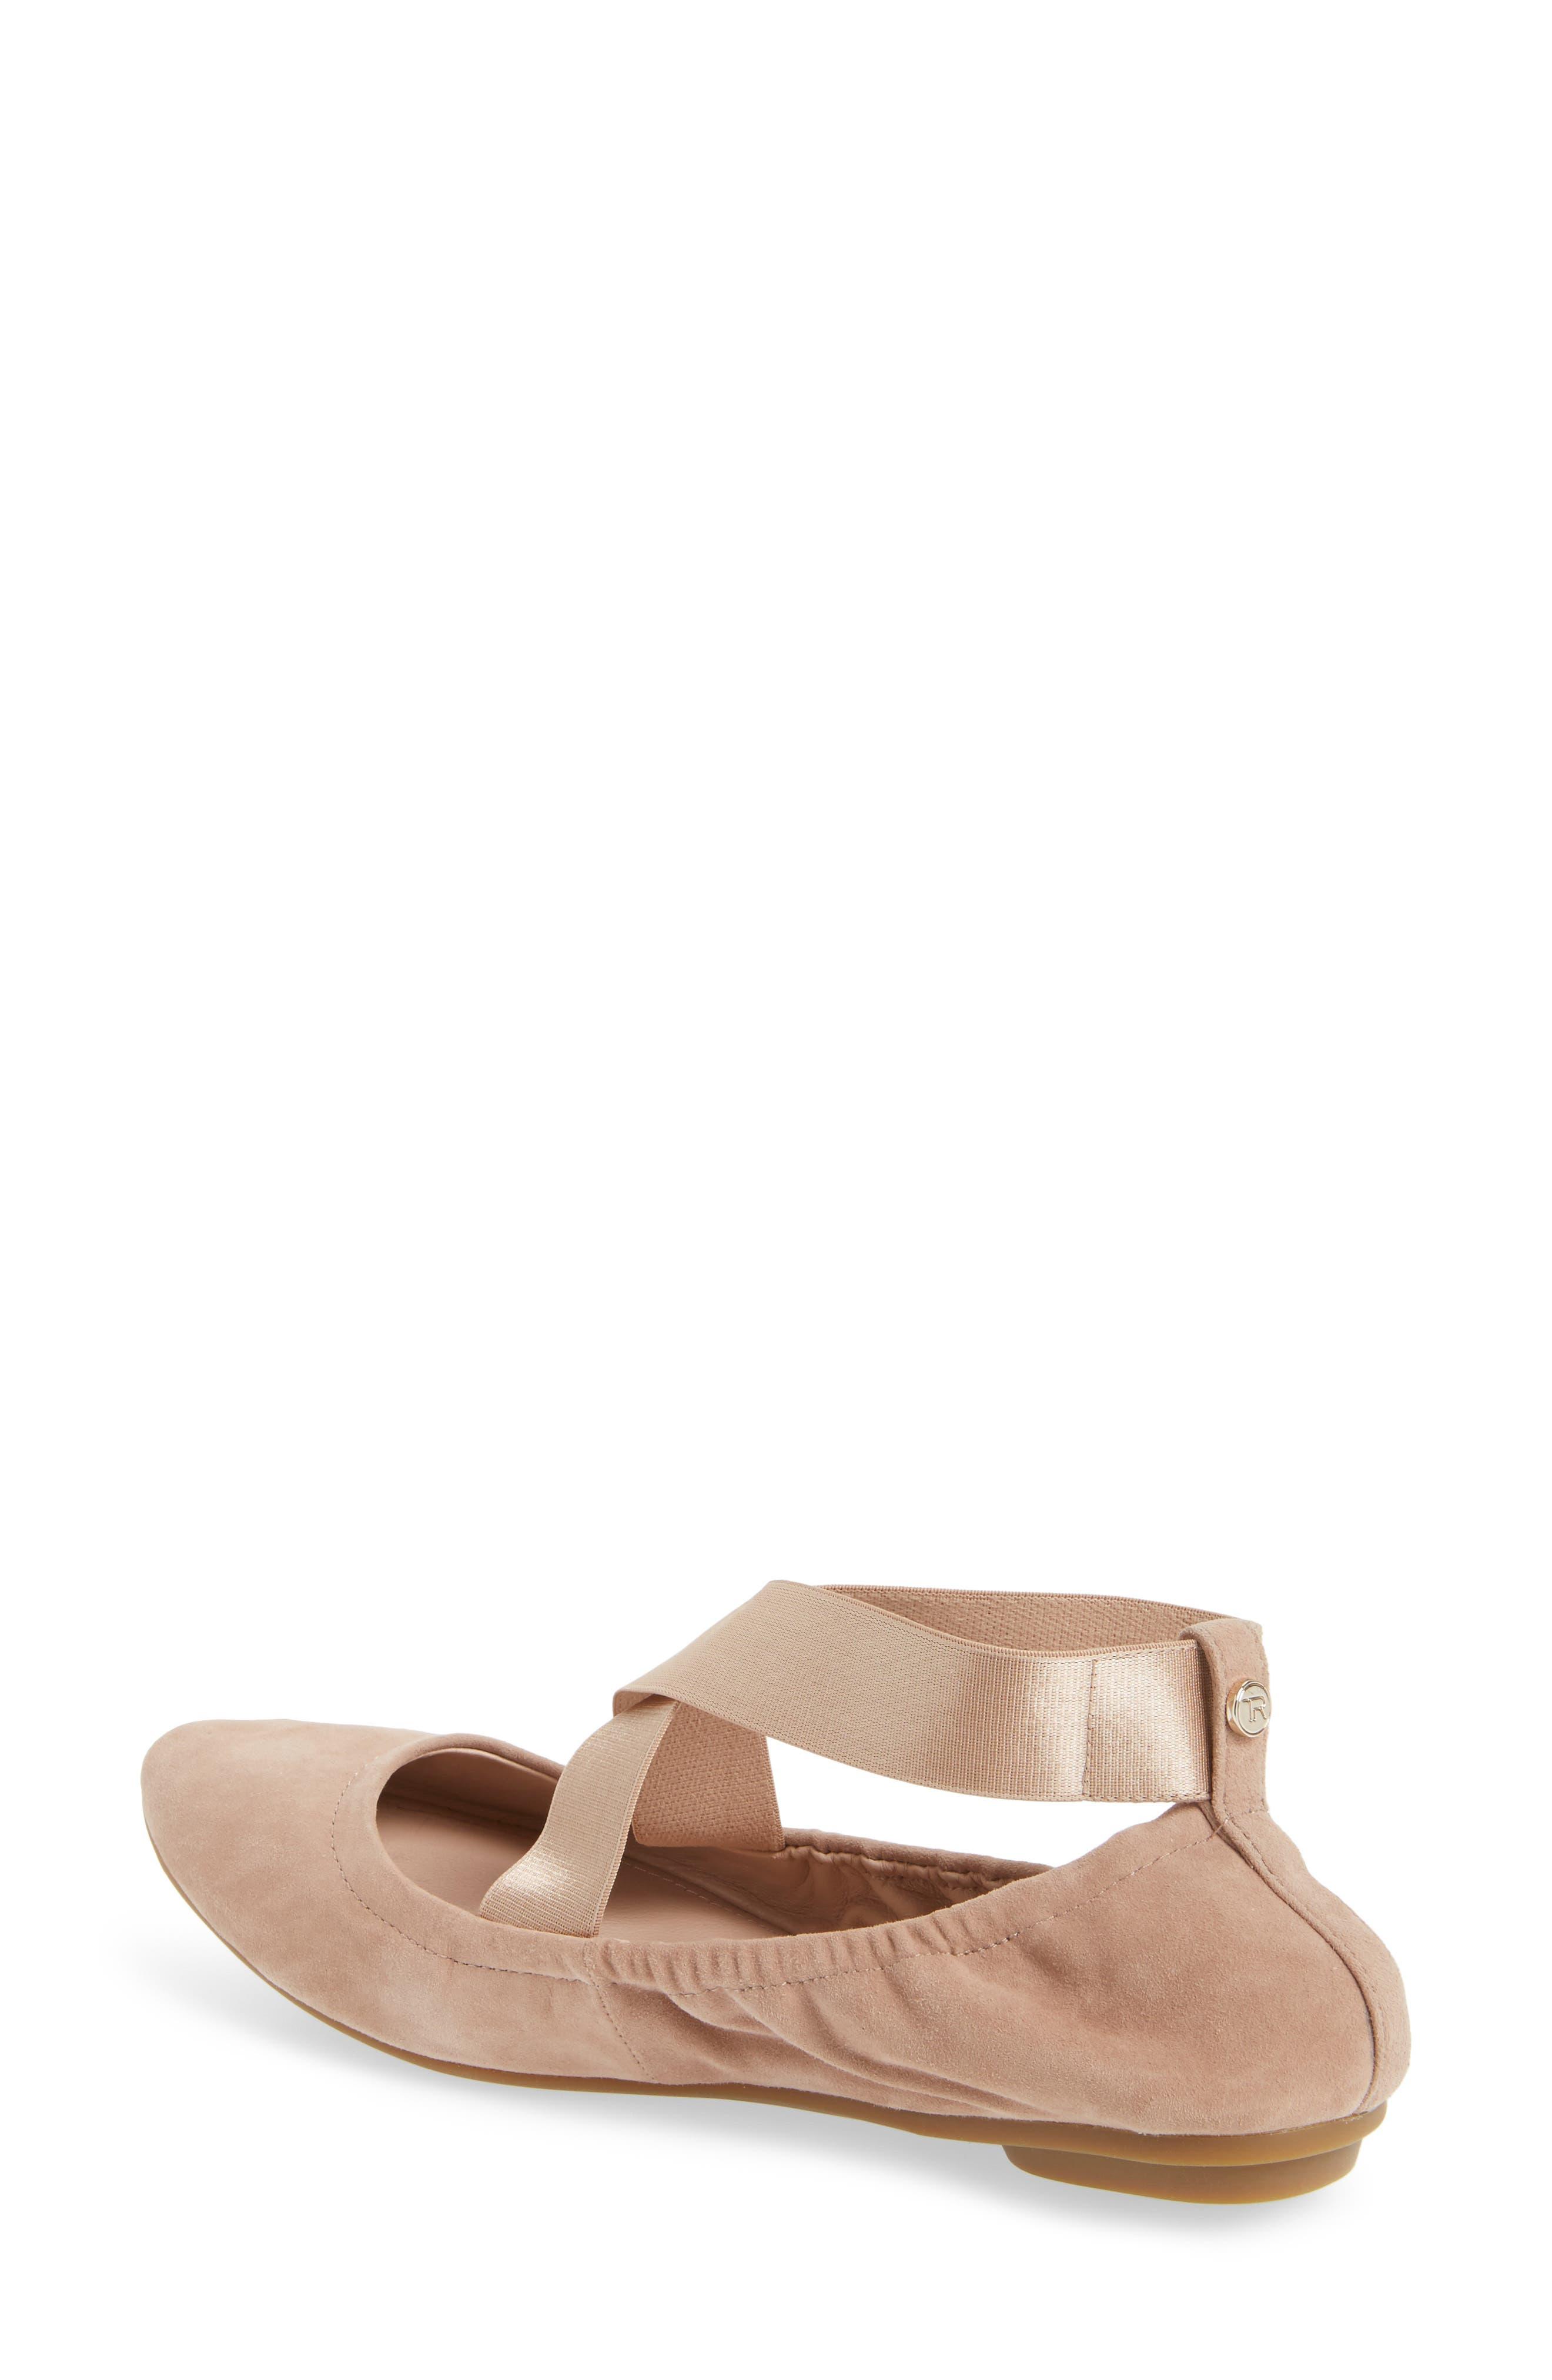 Edina Strappy Ballet Flat,                             Alternate thumbnail 2, color,                             Soft Beige Suede